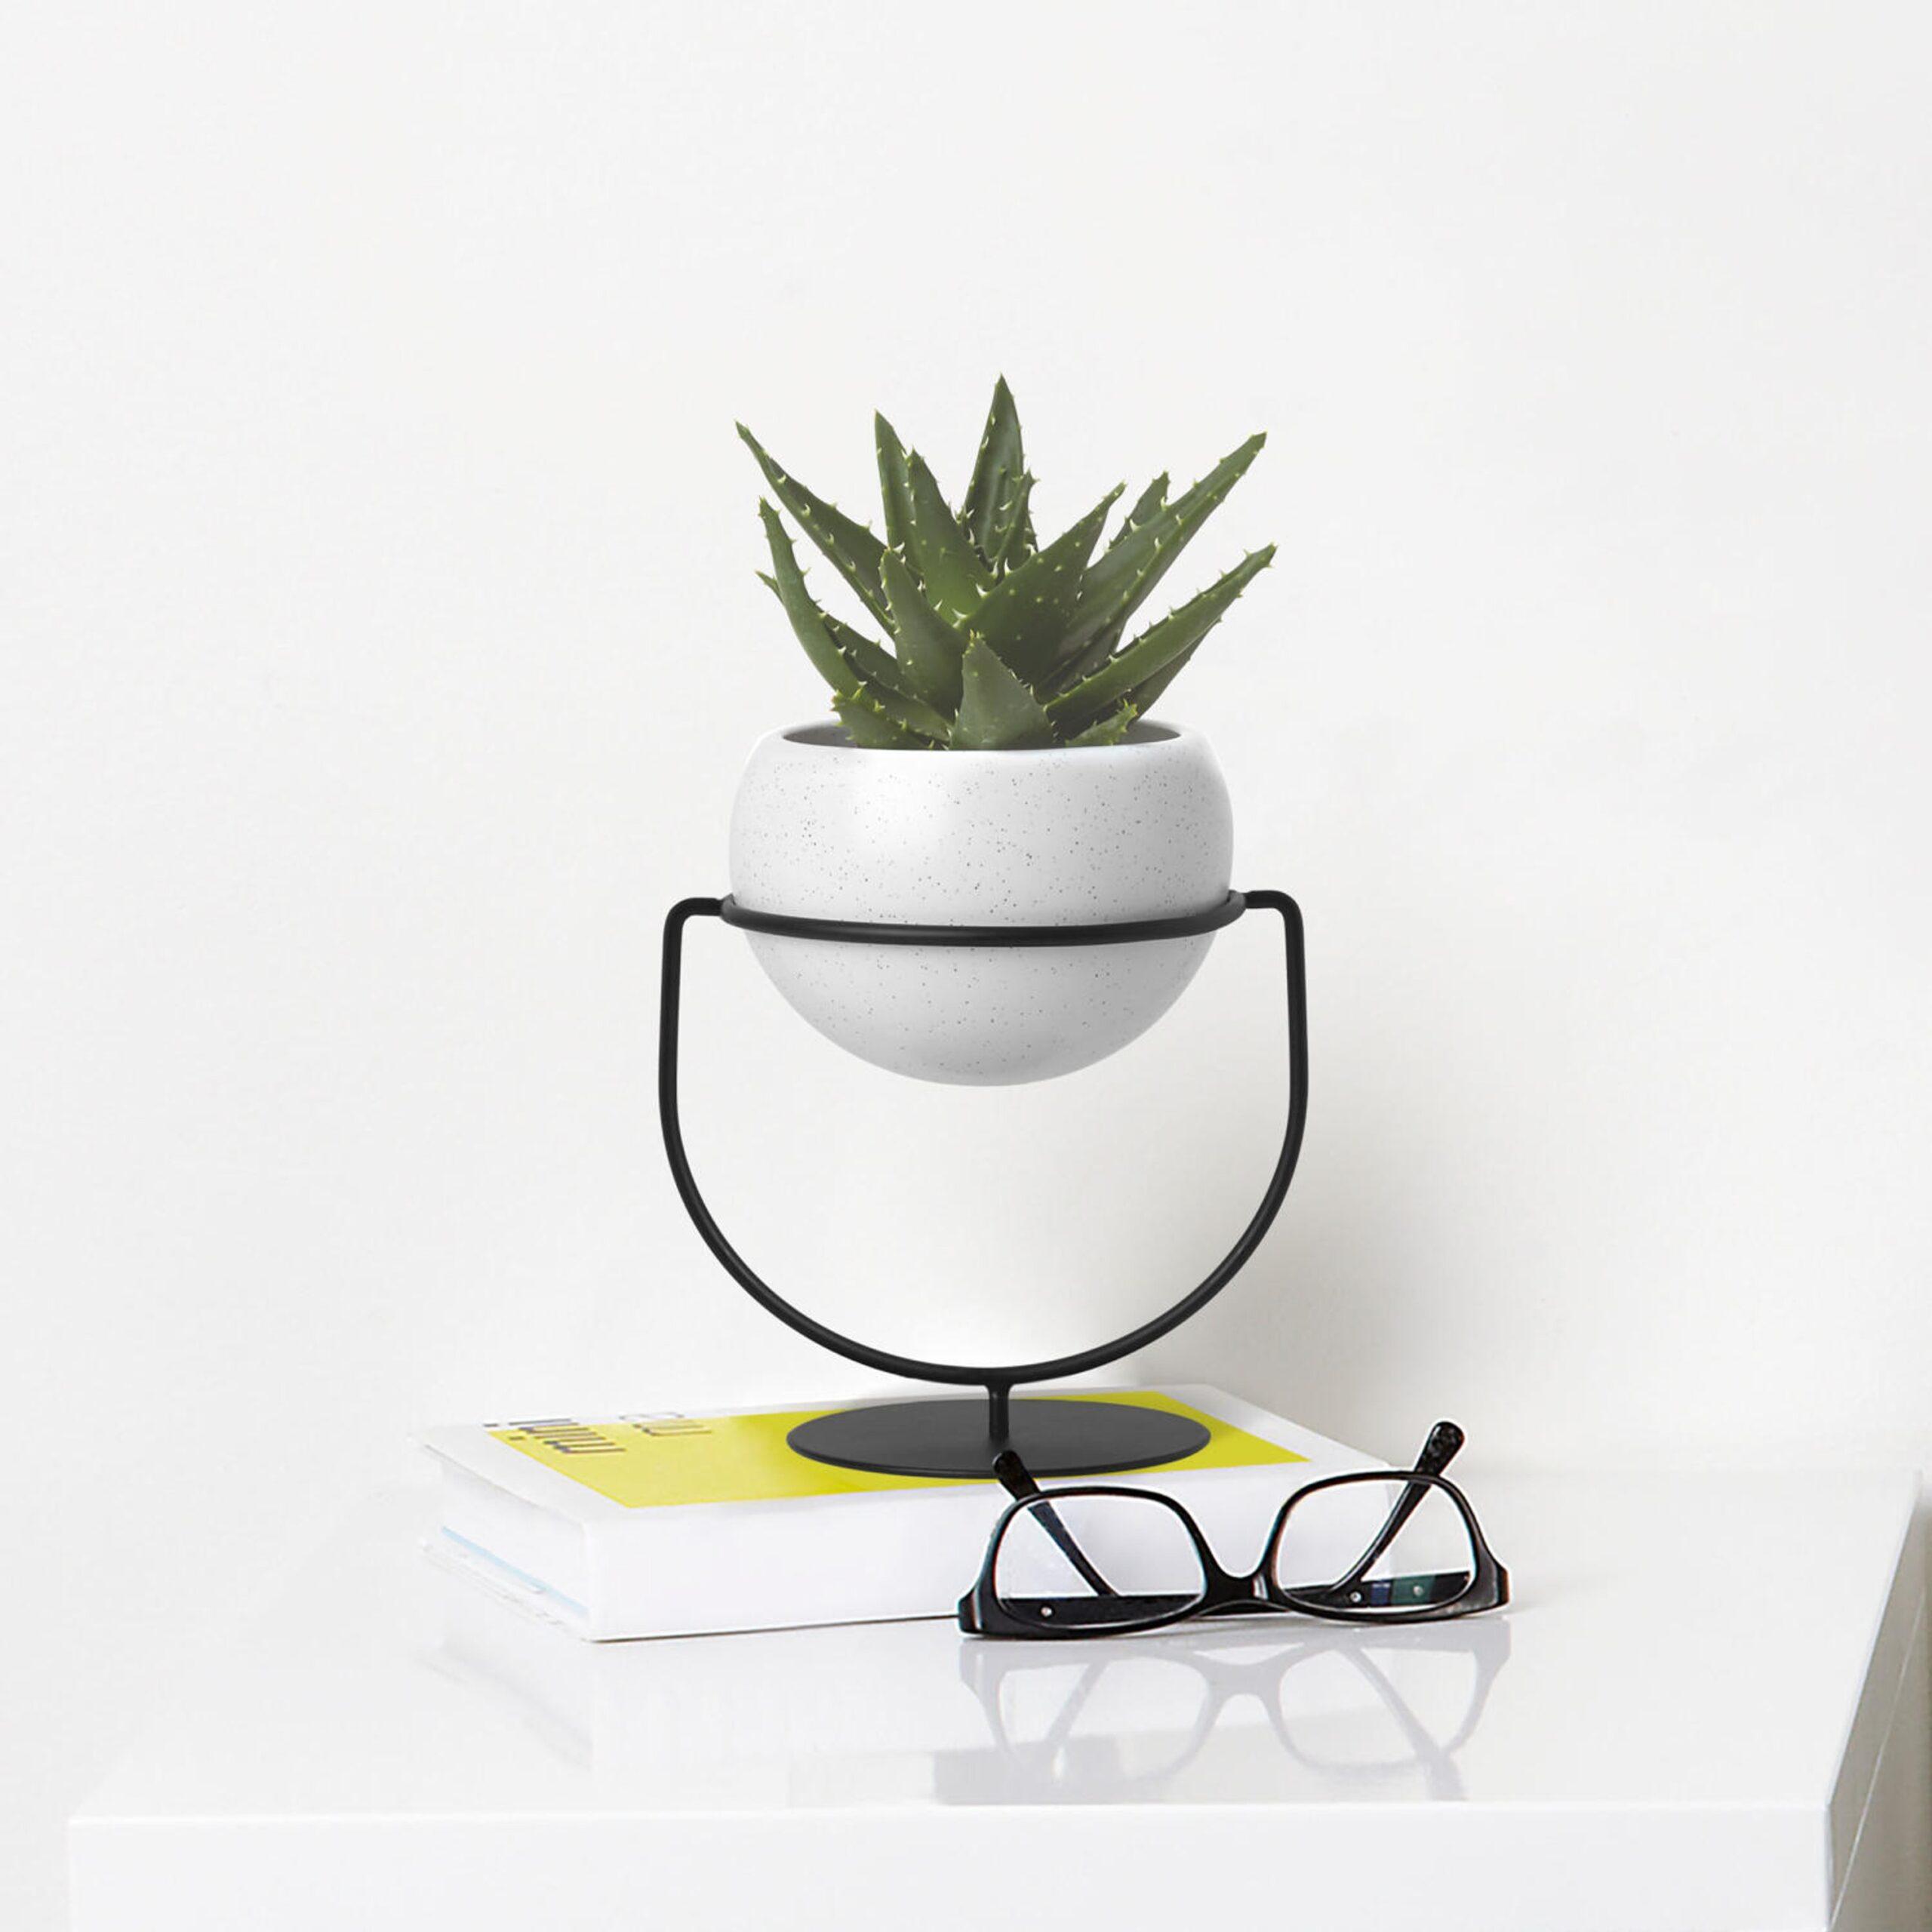 Full Size of Kräutertopf Keramik Umbra Nesta Pflanzenhalter Küche Waschbecken Wohnzimmer Kräutertopf Keramik